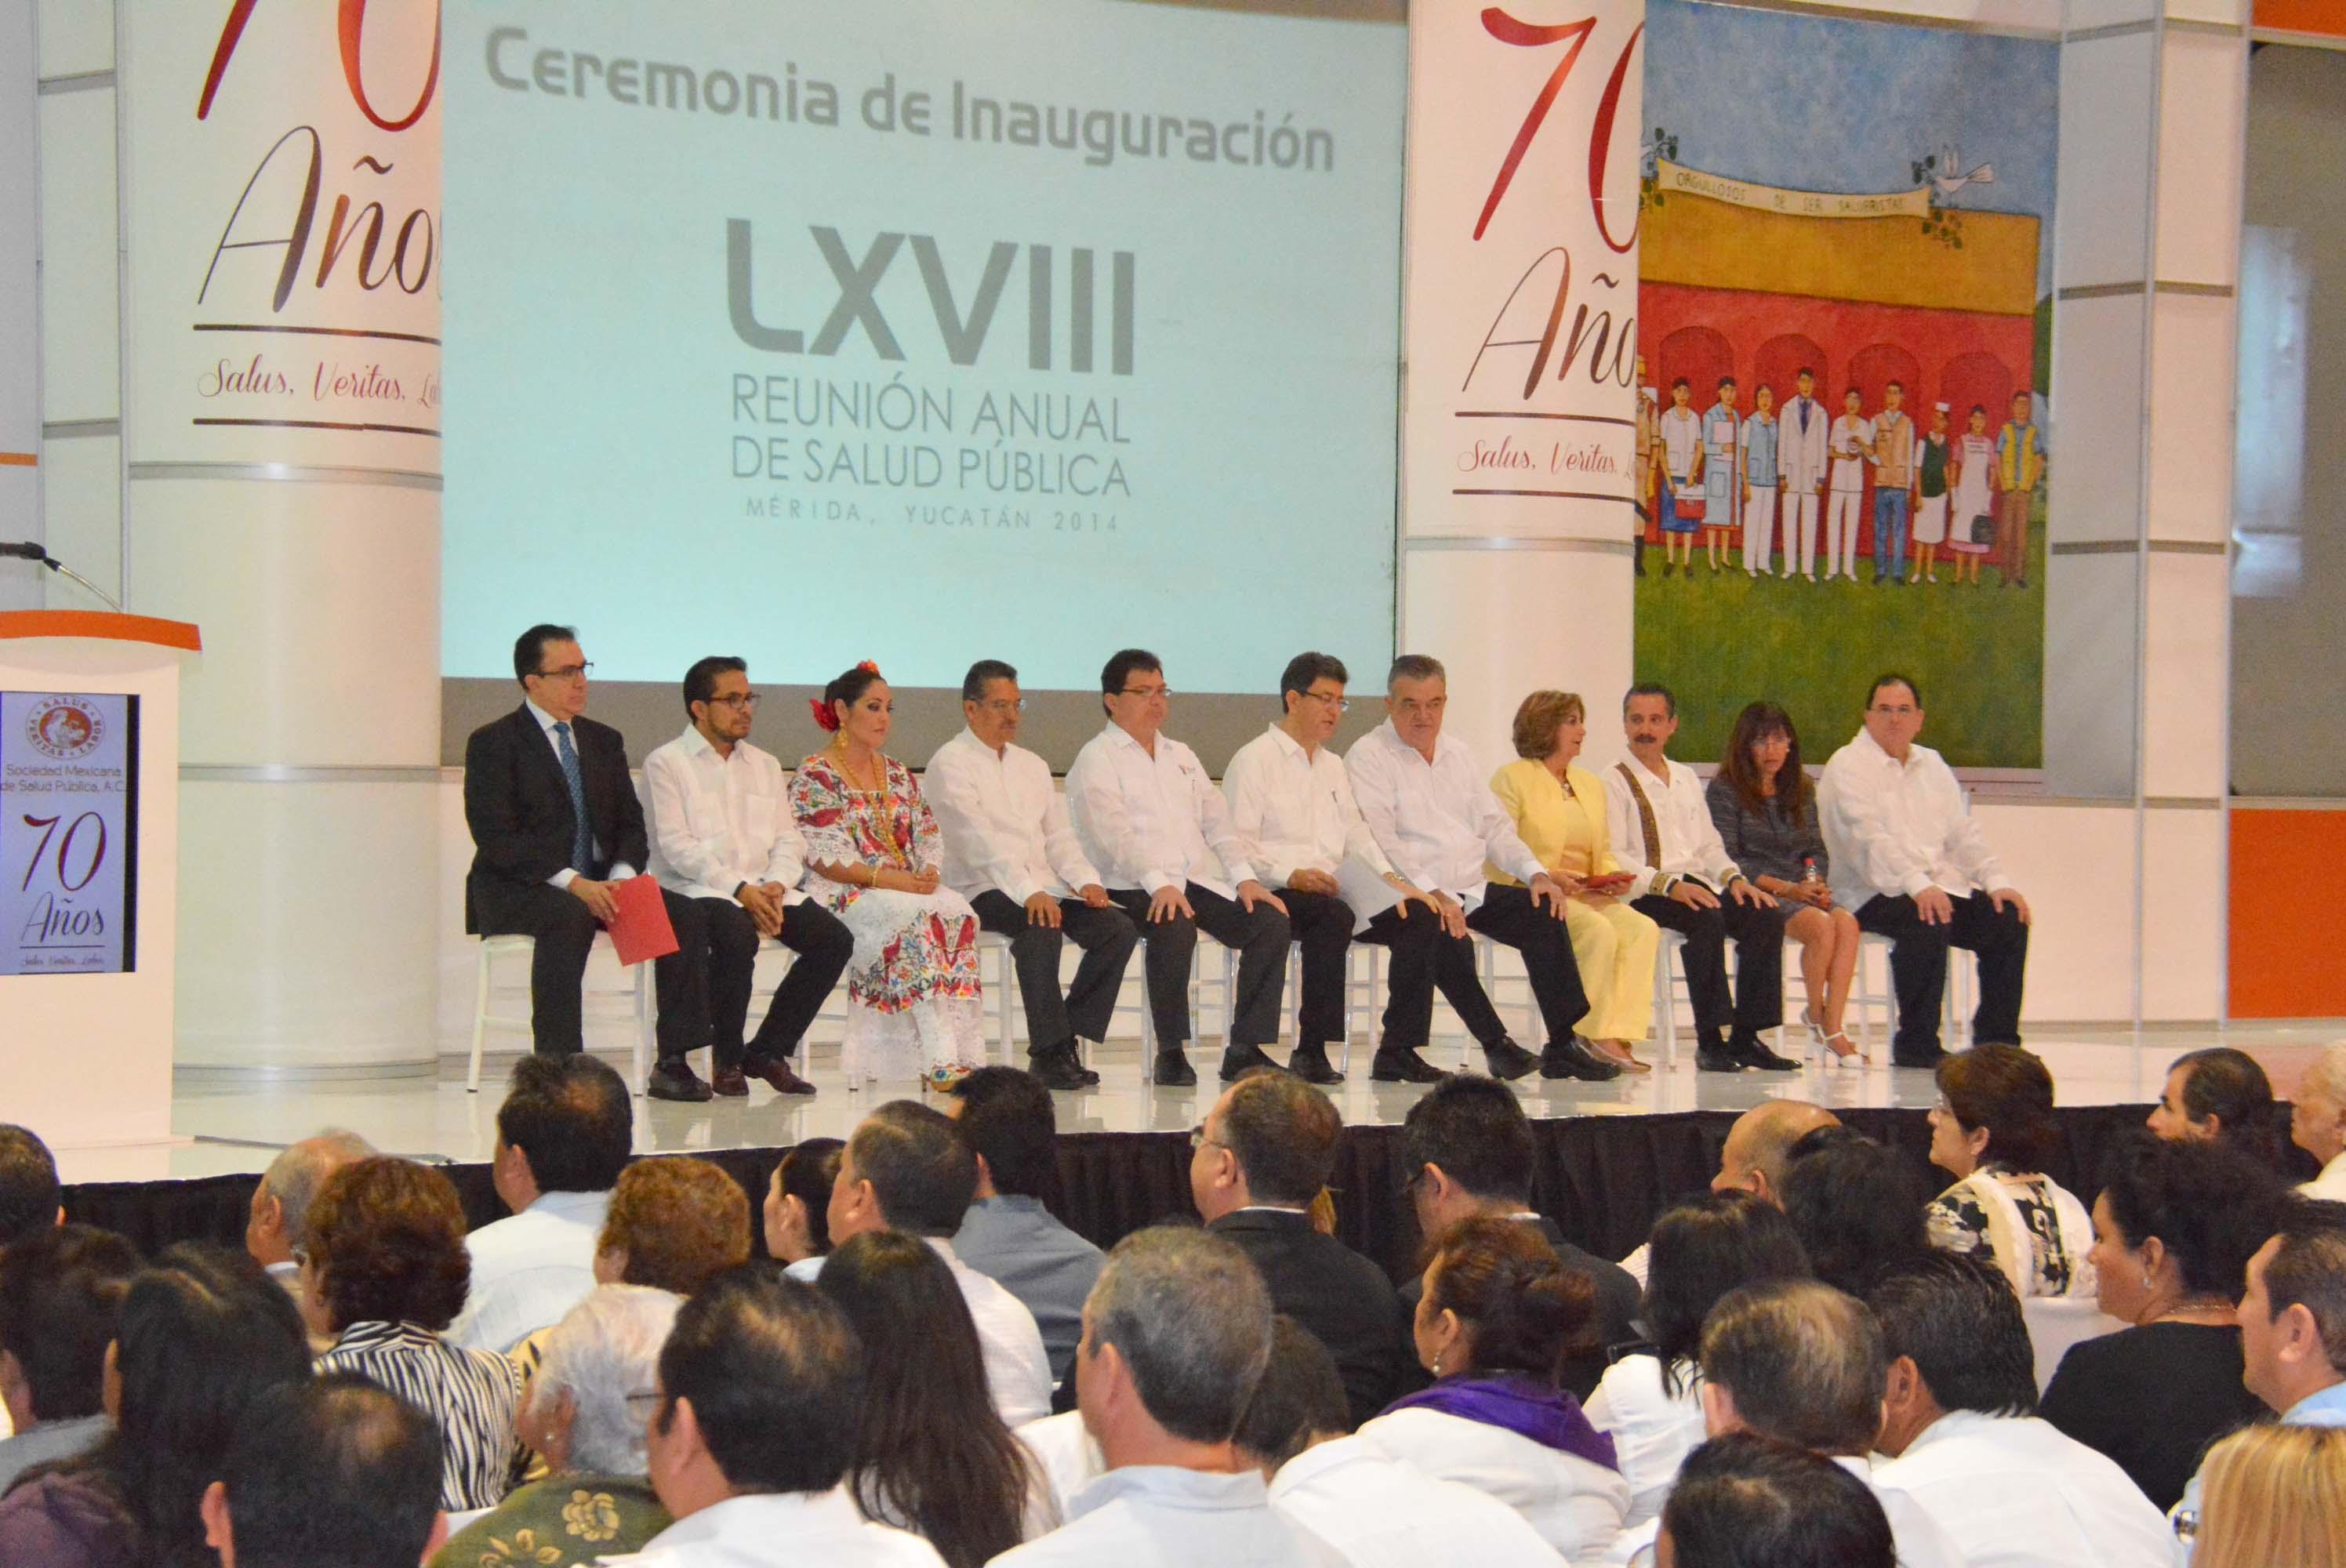 LXVIII Reunión Anual de Salud Pública